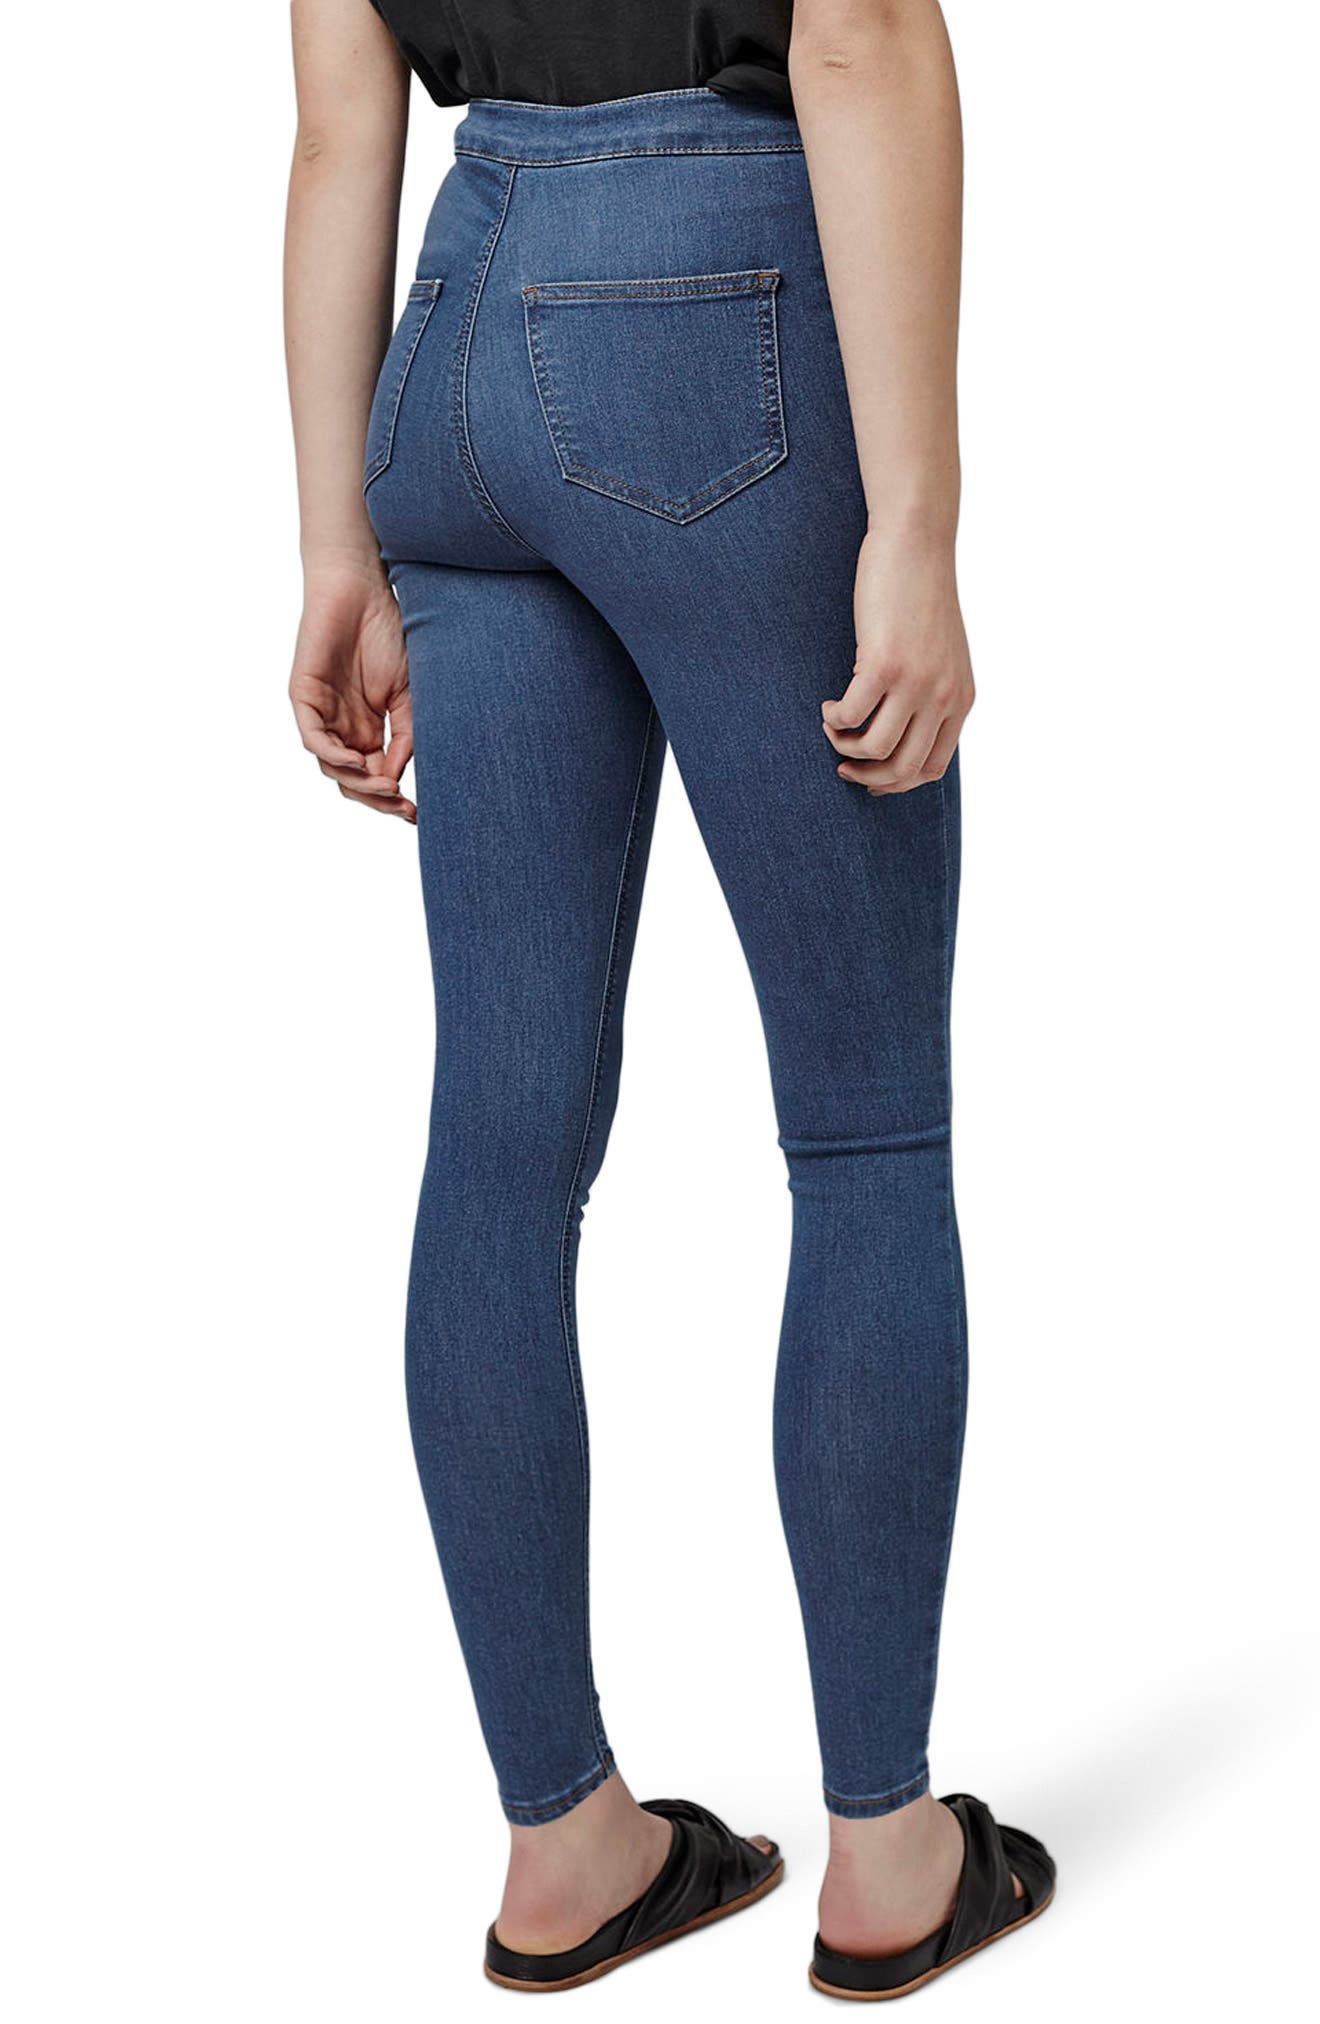 Joni Mid Denim Jeans,                             Alternate thumbnail 2, color,                             Mid Denim